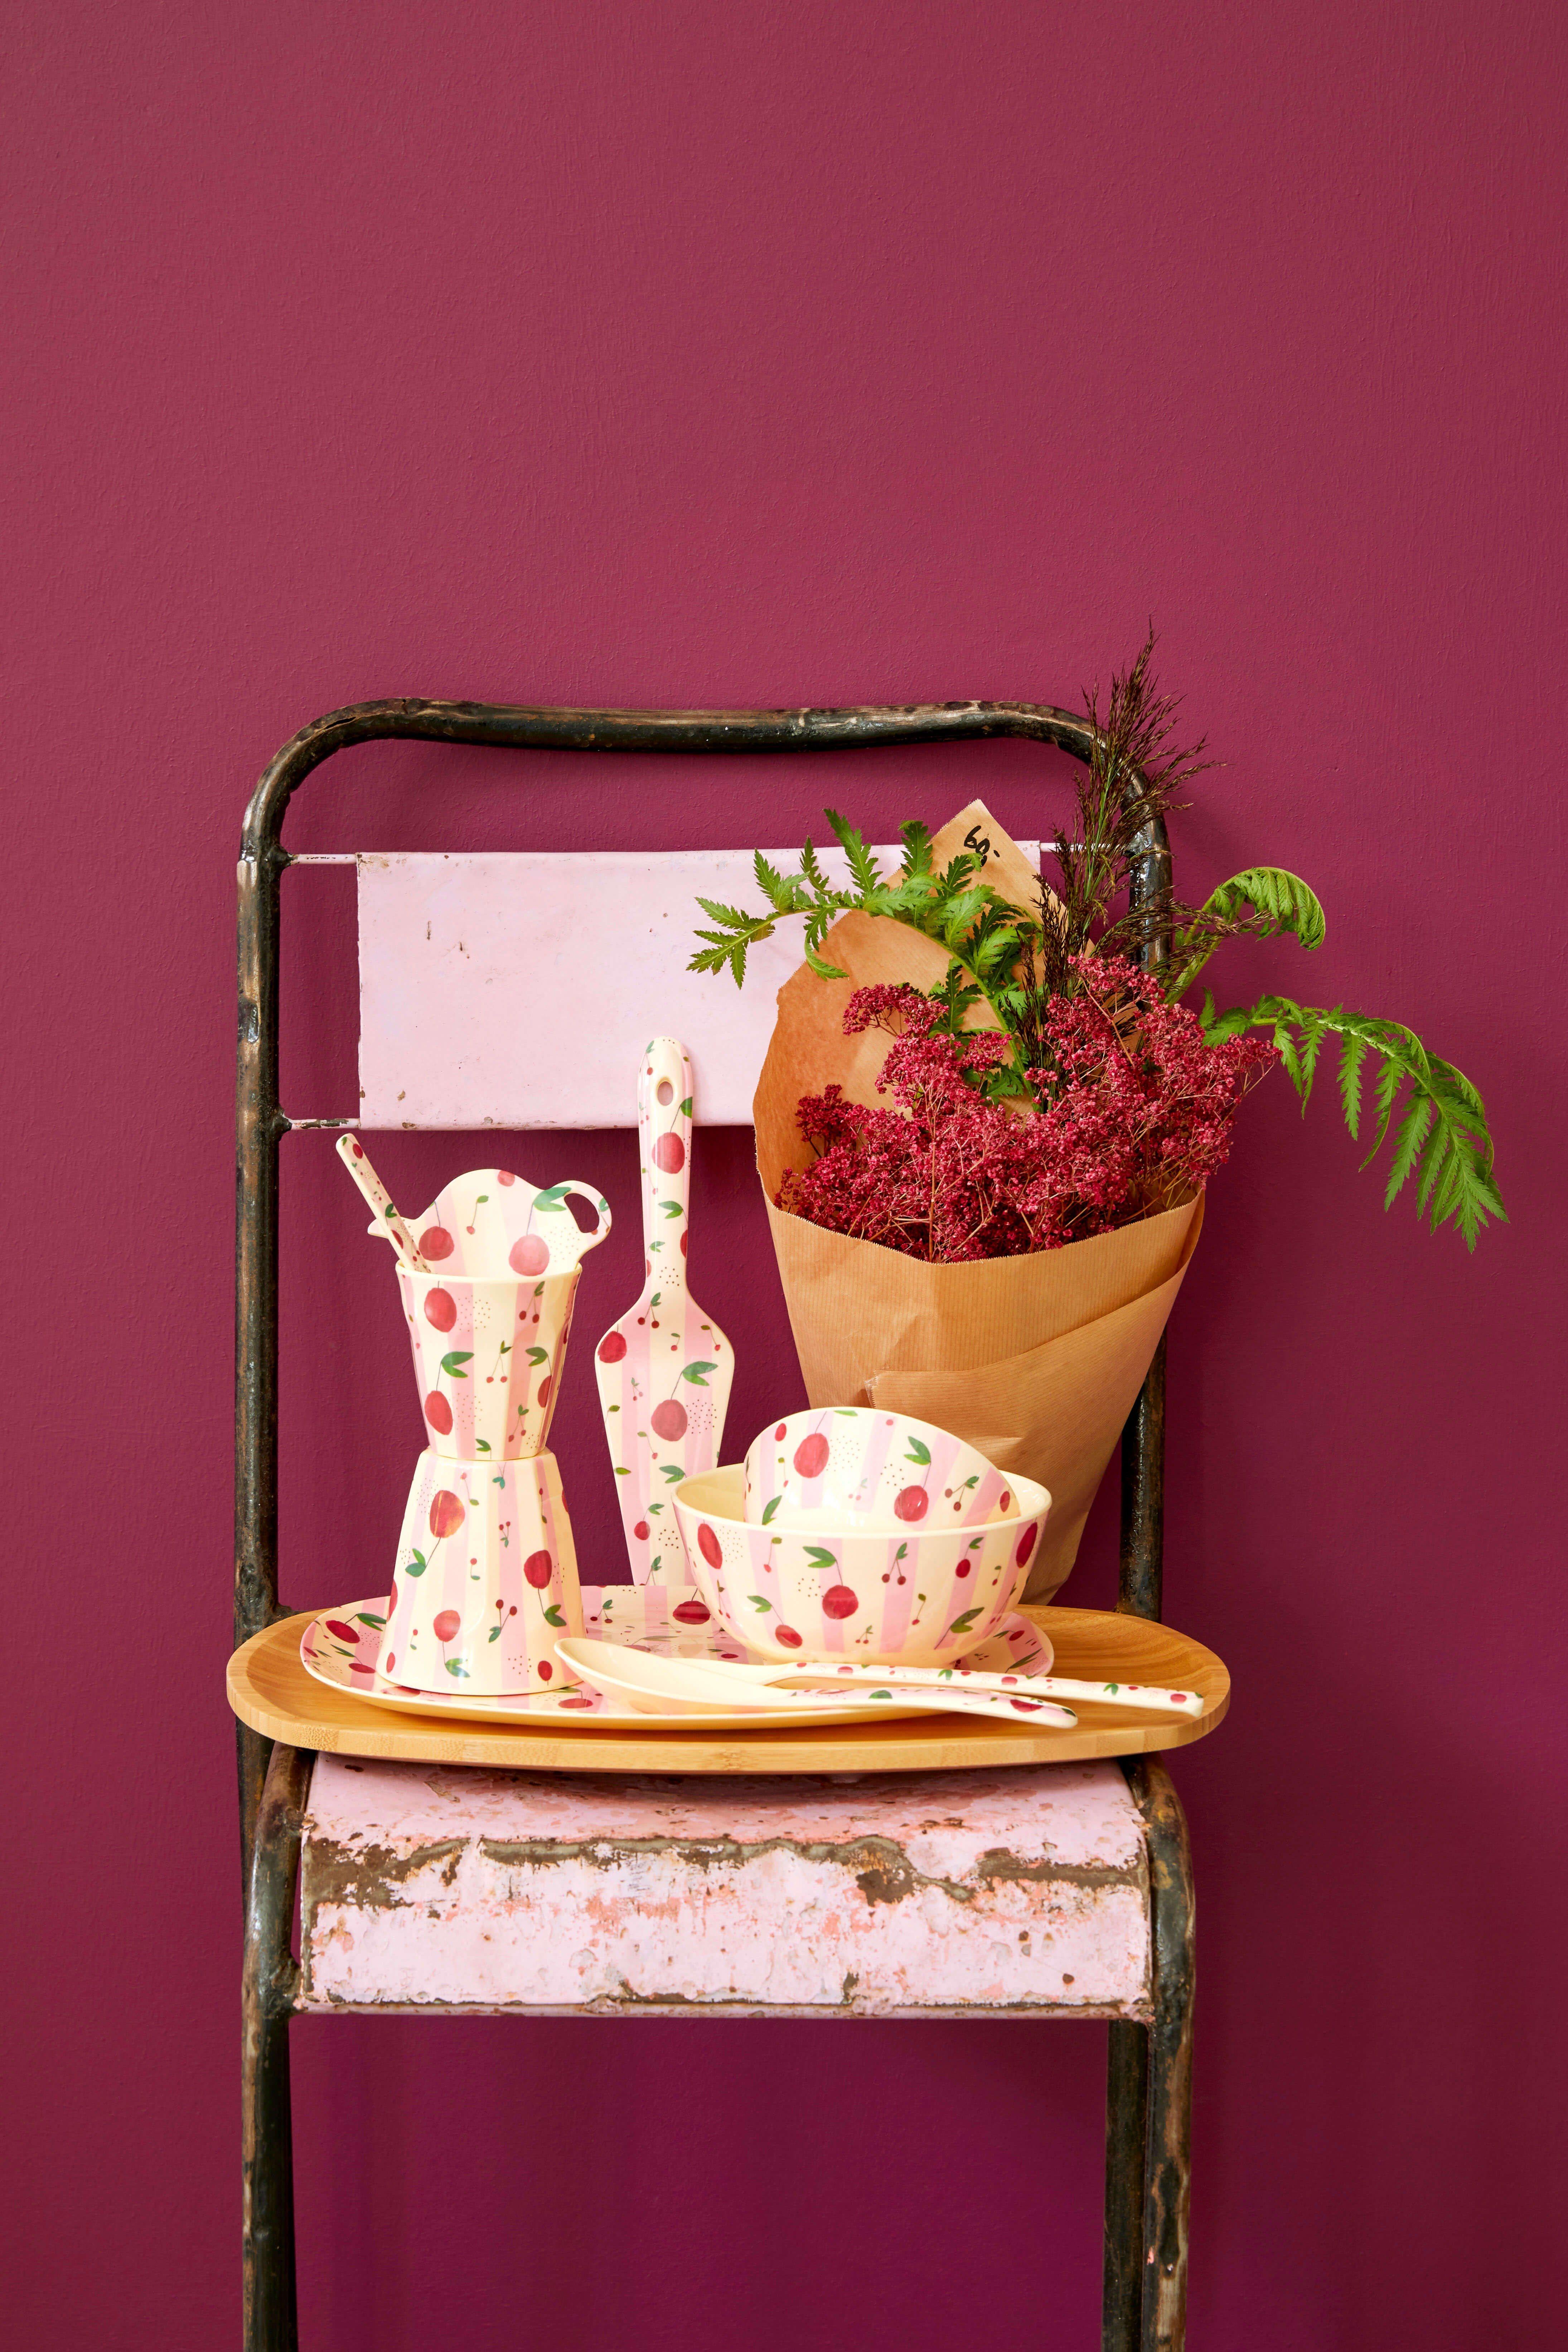 Löffel kurz - Melamine Teaspoon - Cherry Print - rice